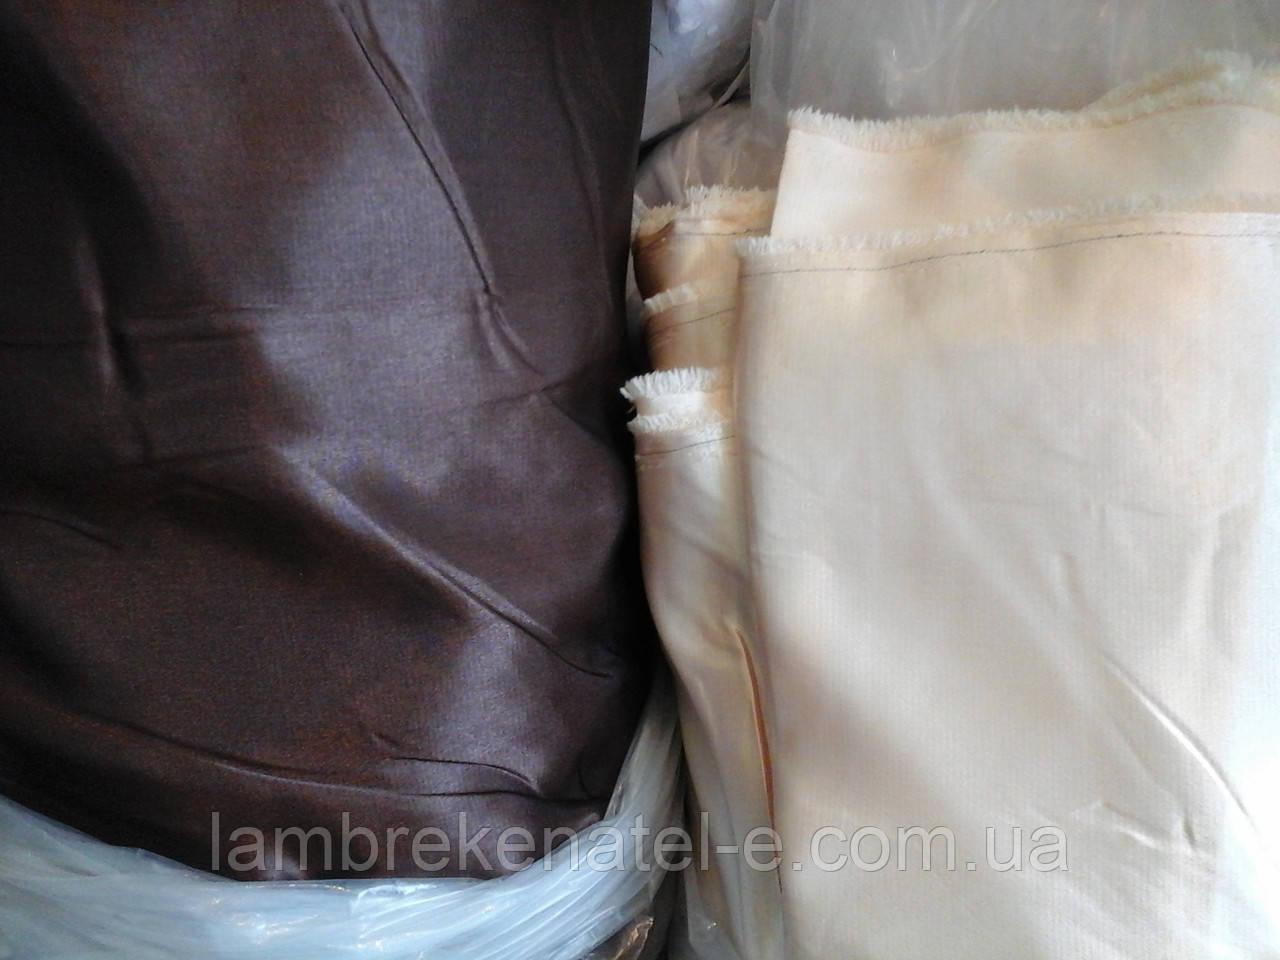 Шторная ткань для ламбрекенов